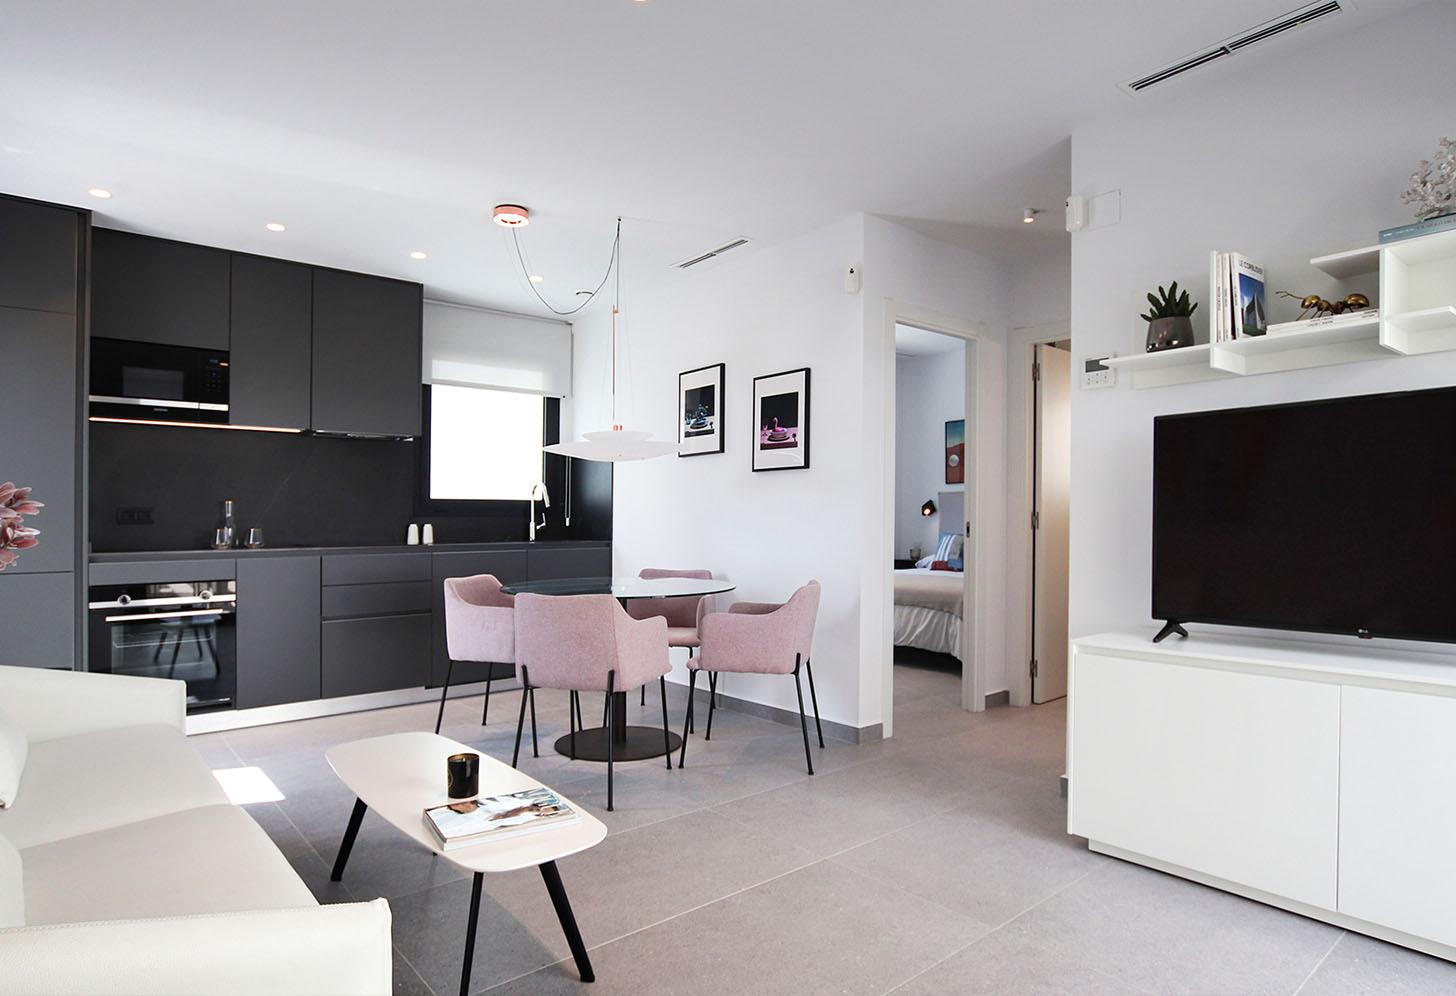 immobilier neuf espagne costa blanca on-3b essence penthouse salon 2